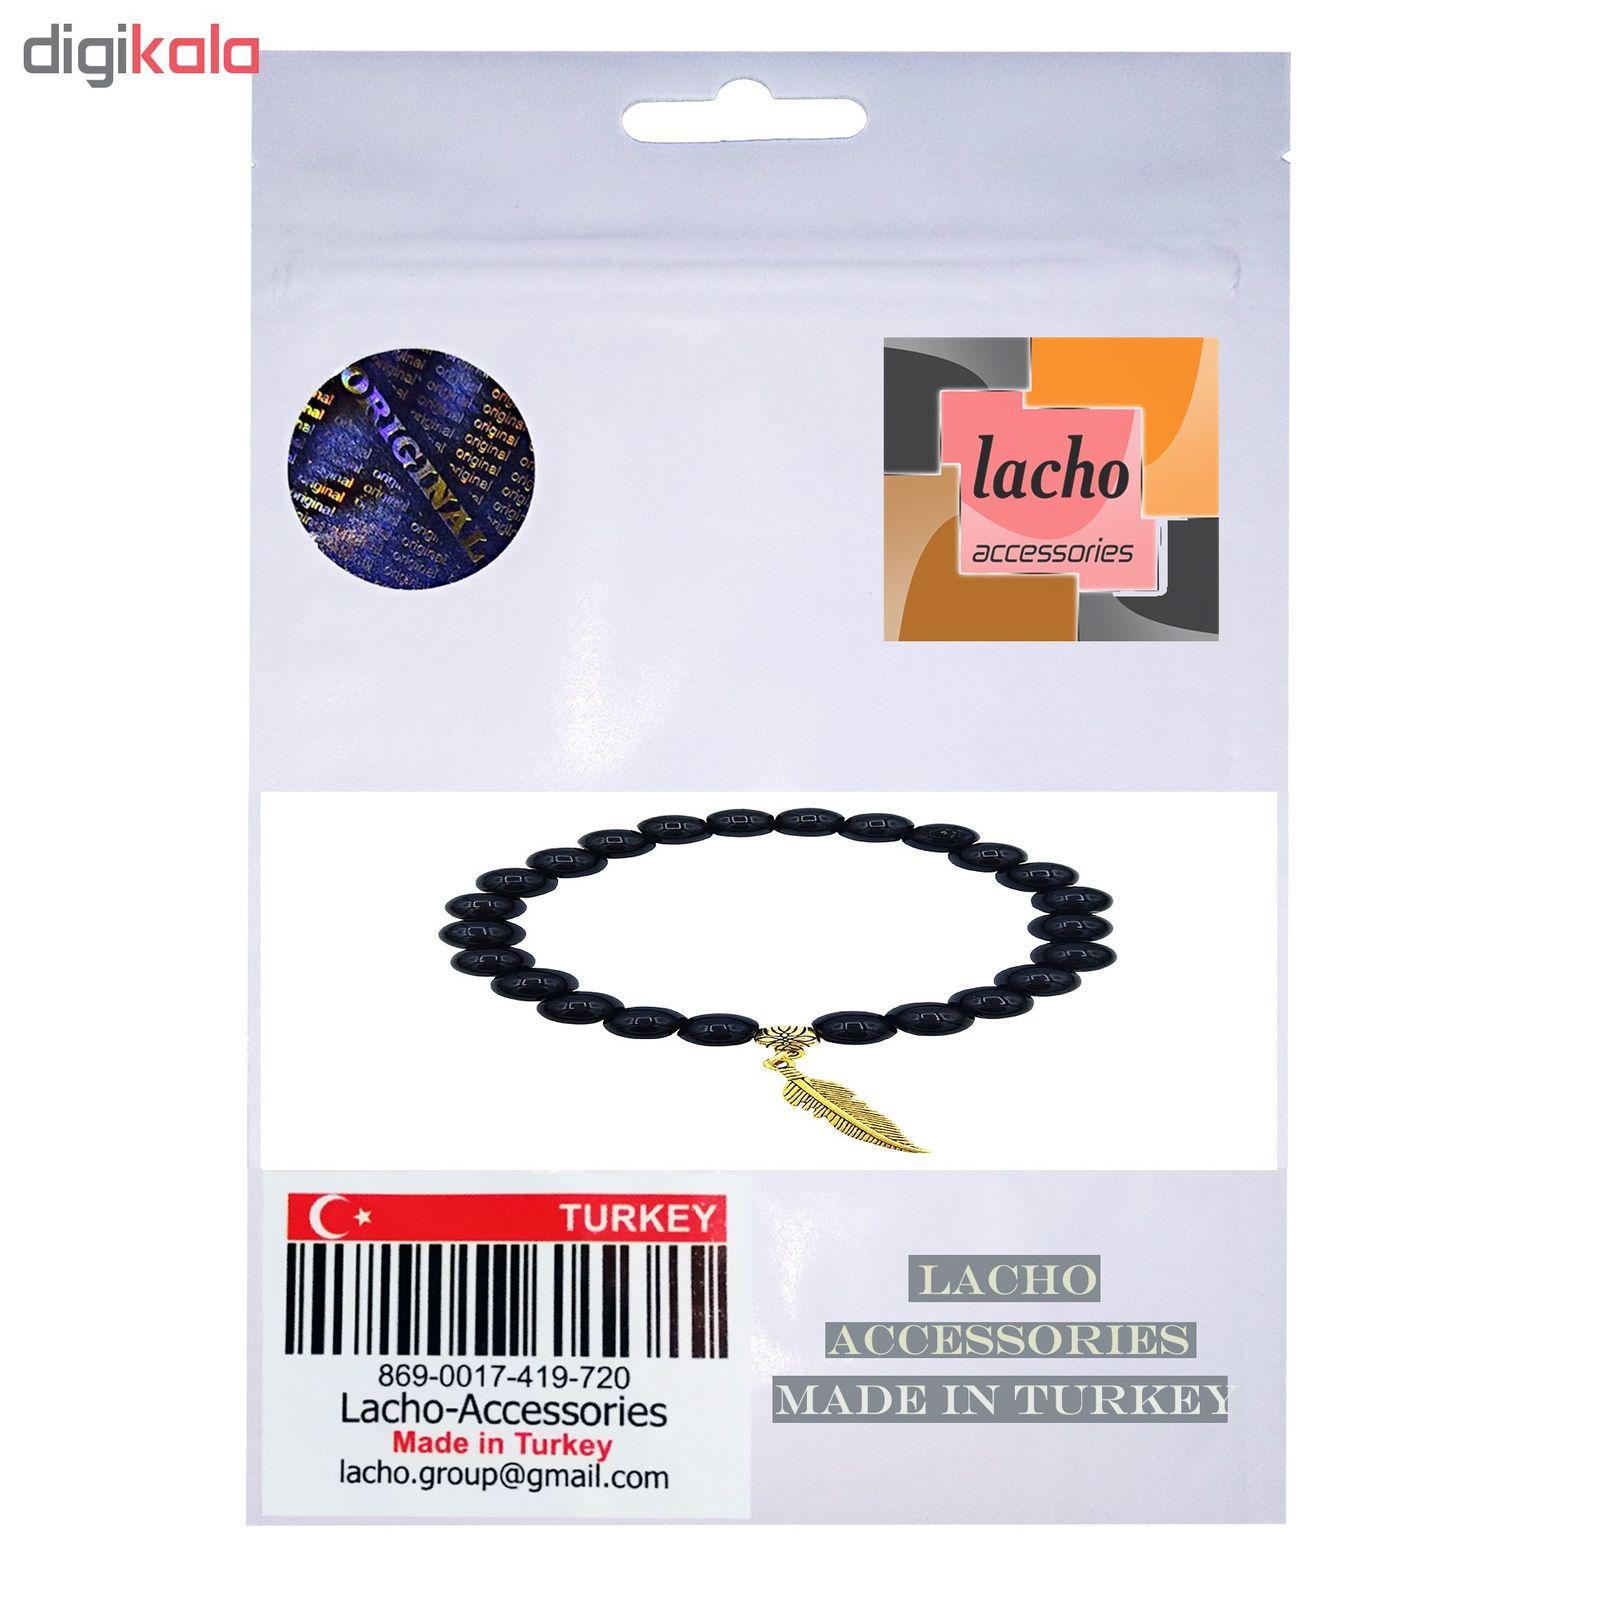 دستبند زنانه لاچو کد 54655 main 1 3